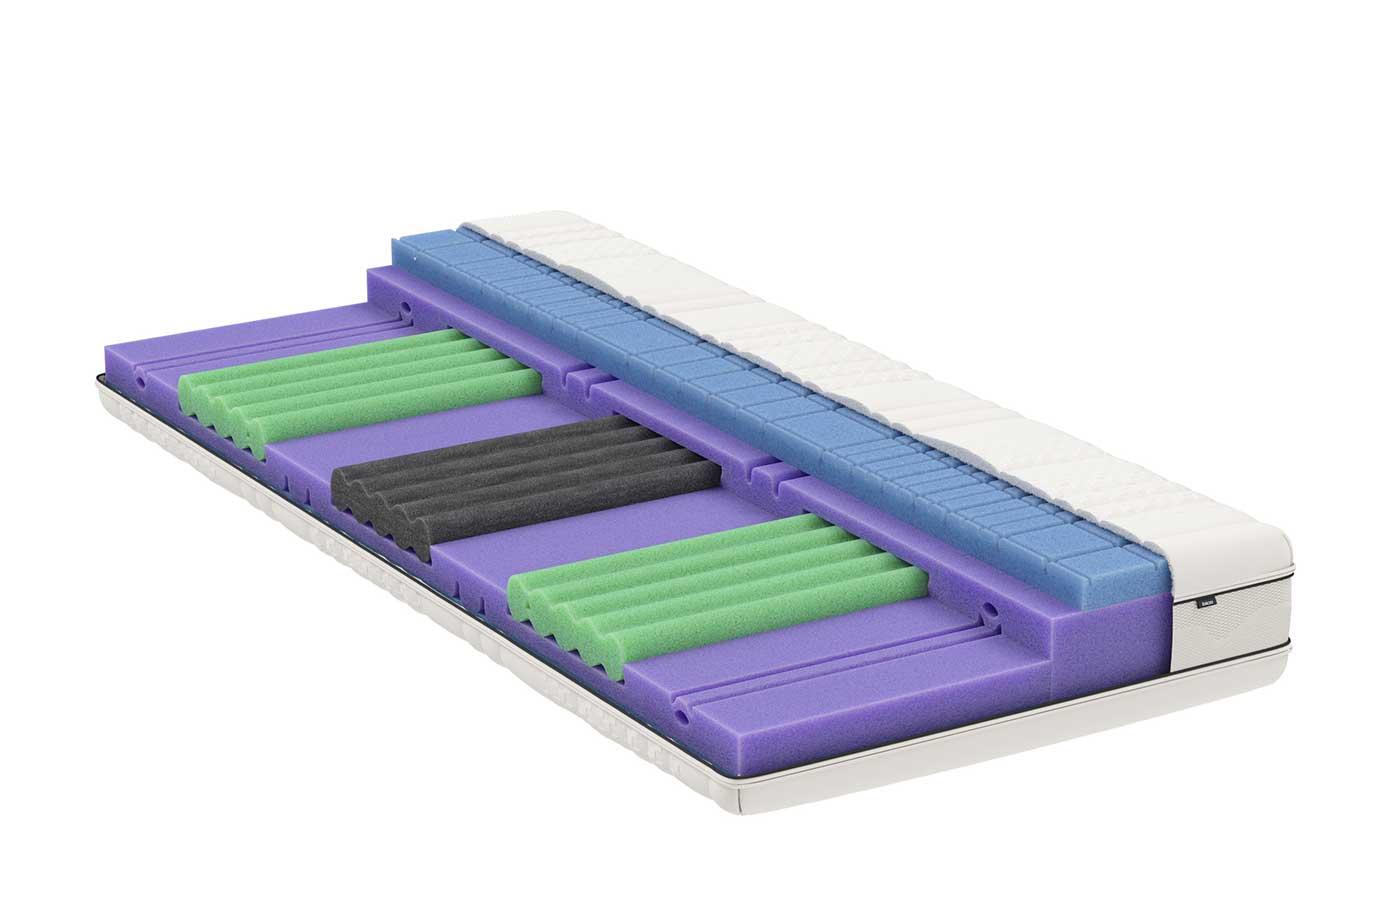 Obermatratze Bico VitaClass